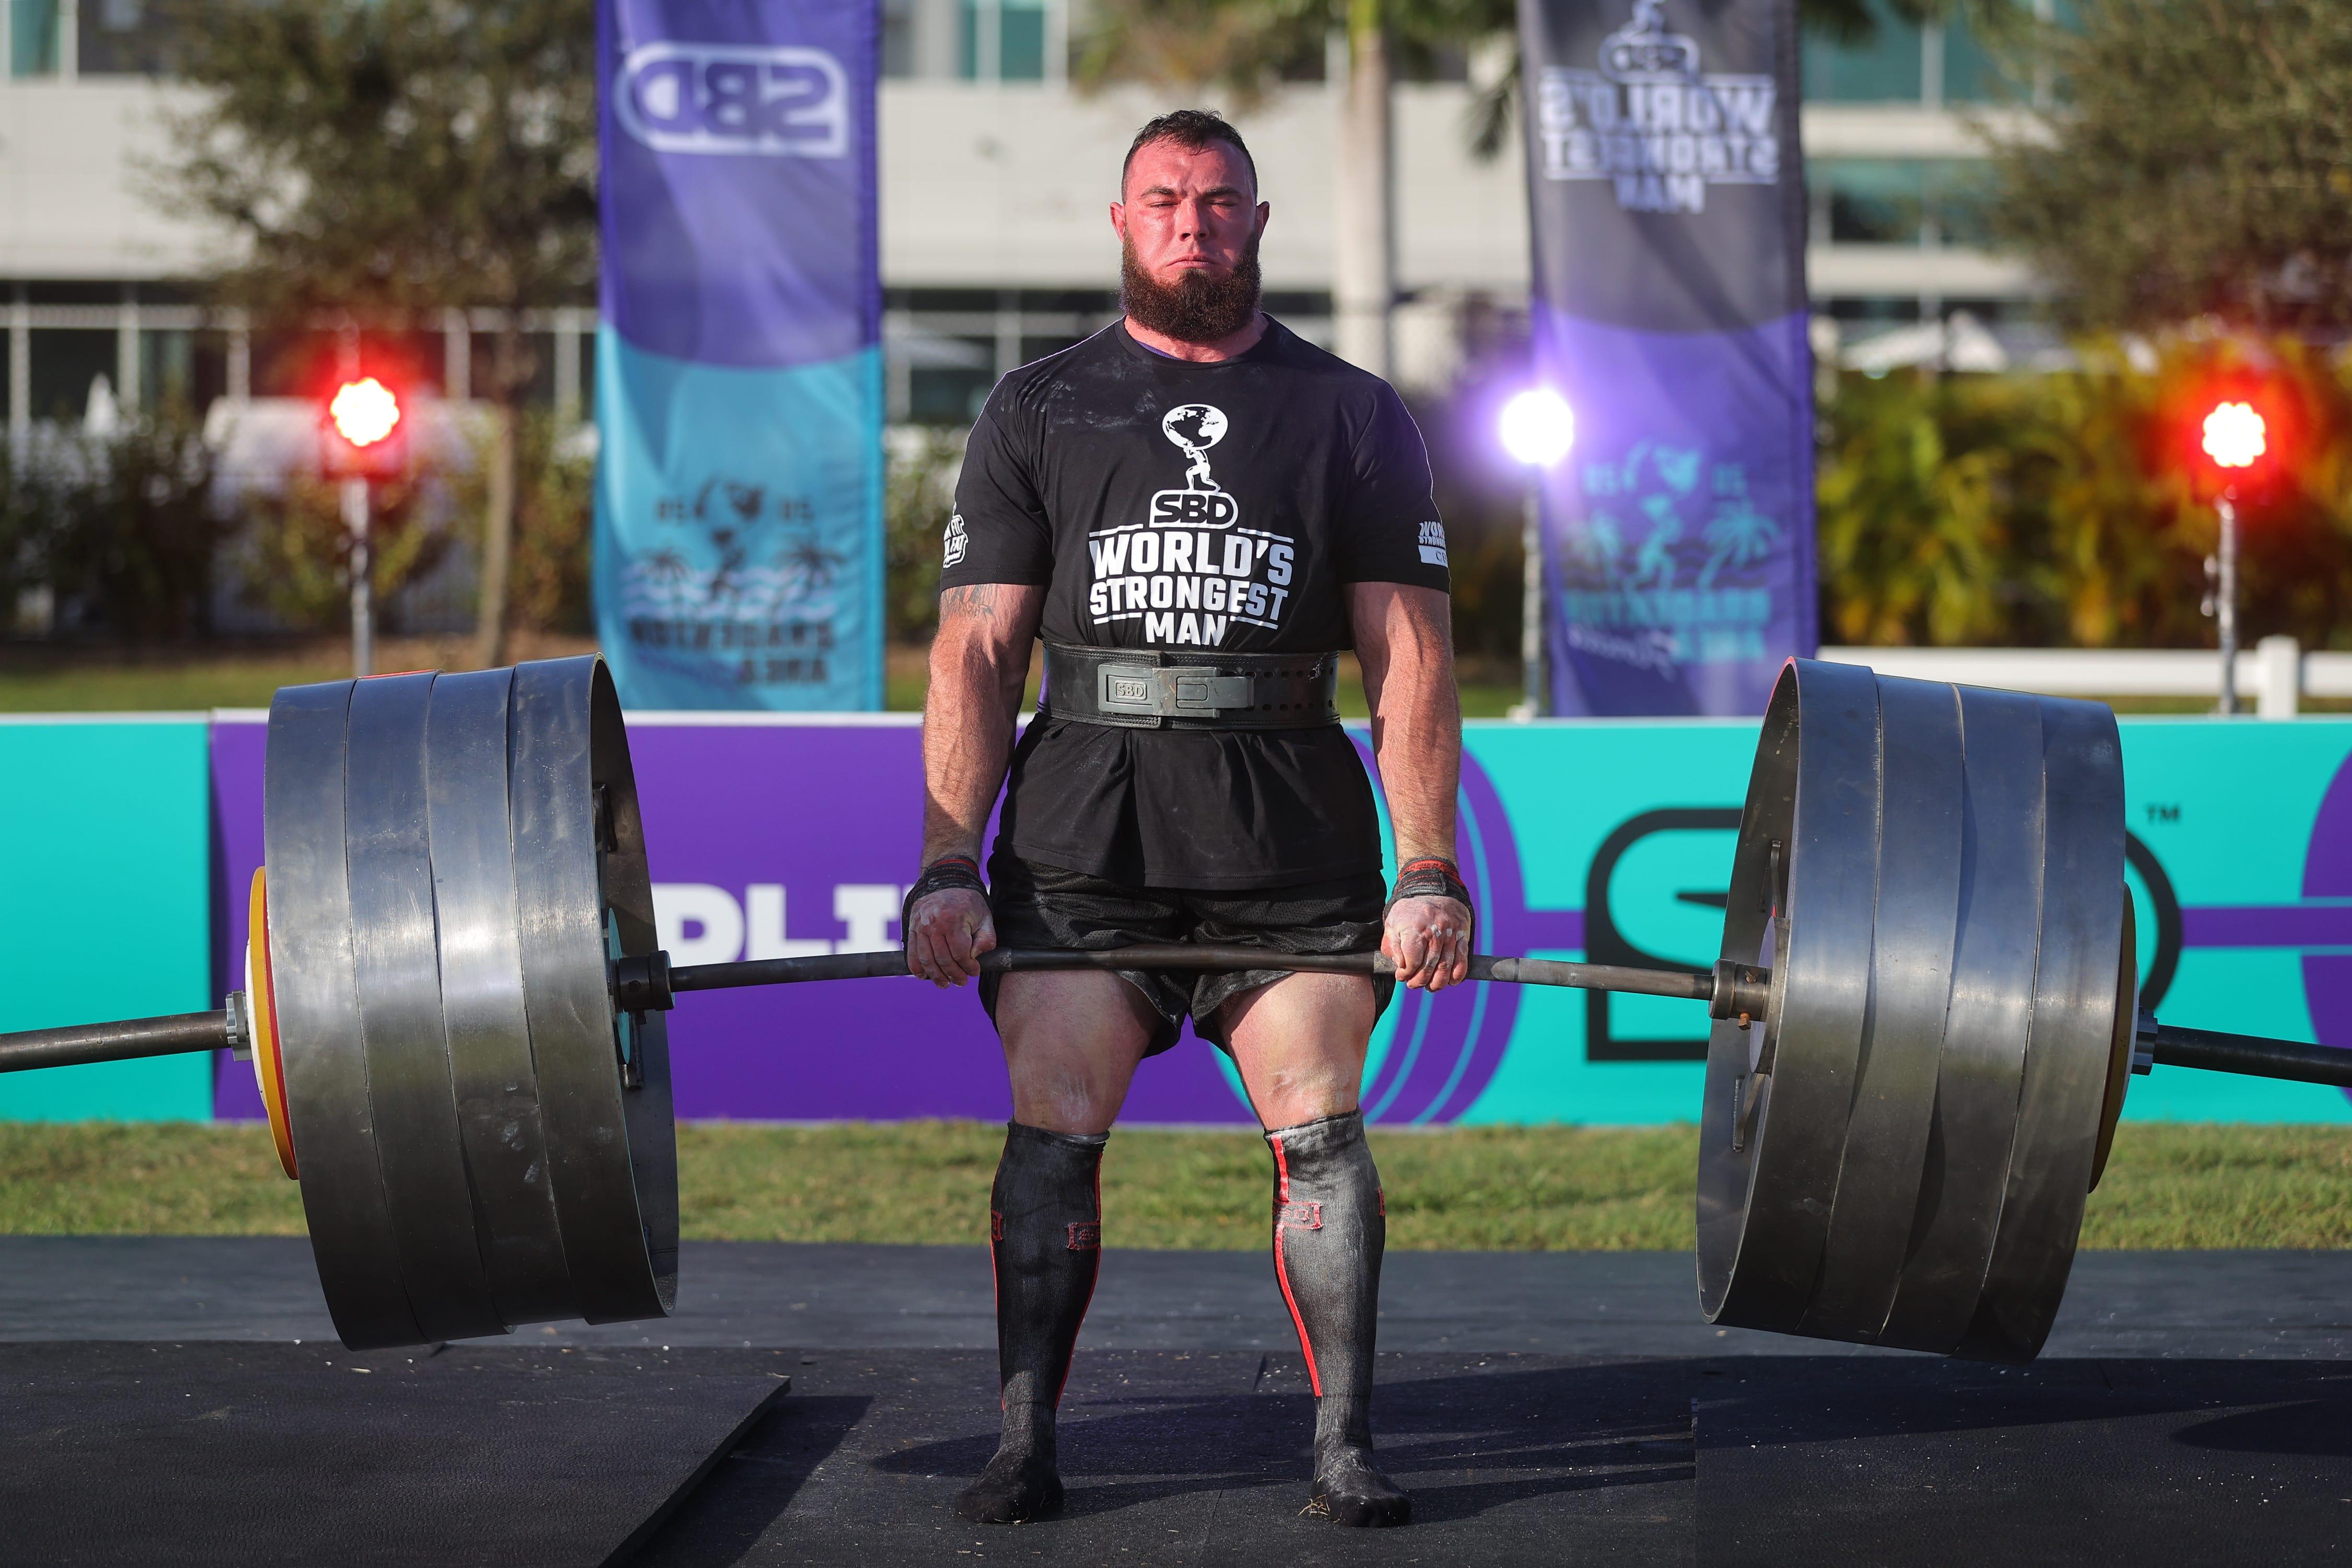 Ukraine's Oleksii Novikov wins 2020 World's Strongest Man after 1,188-pound partial deadlift